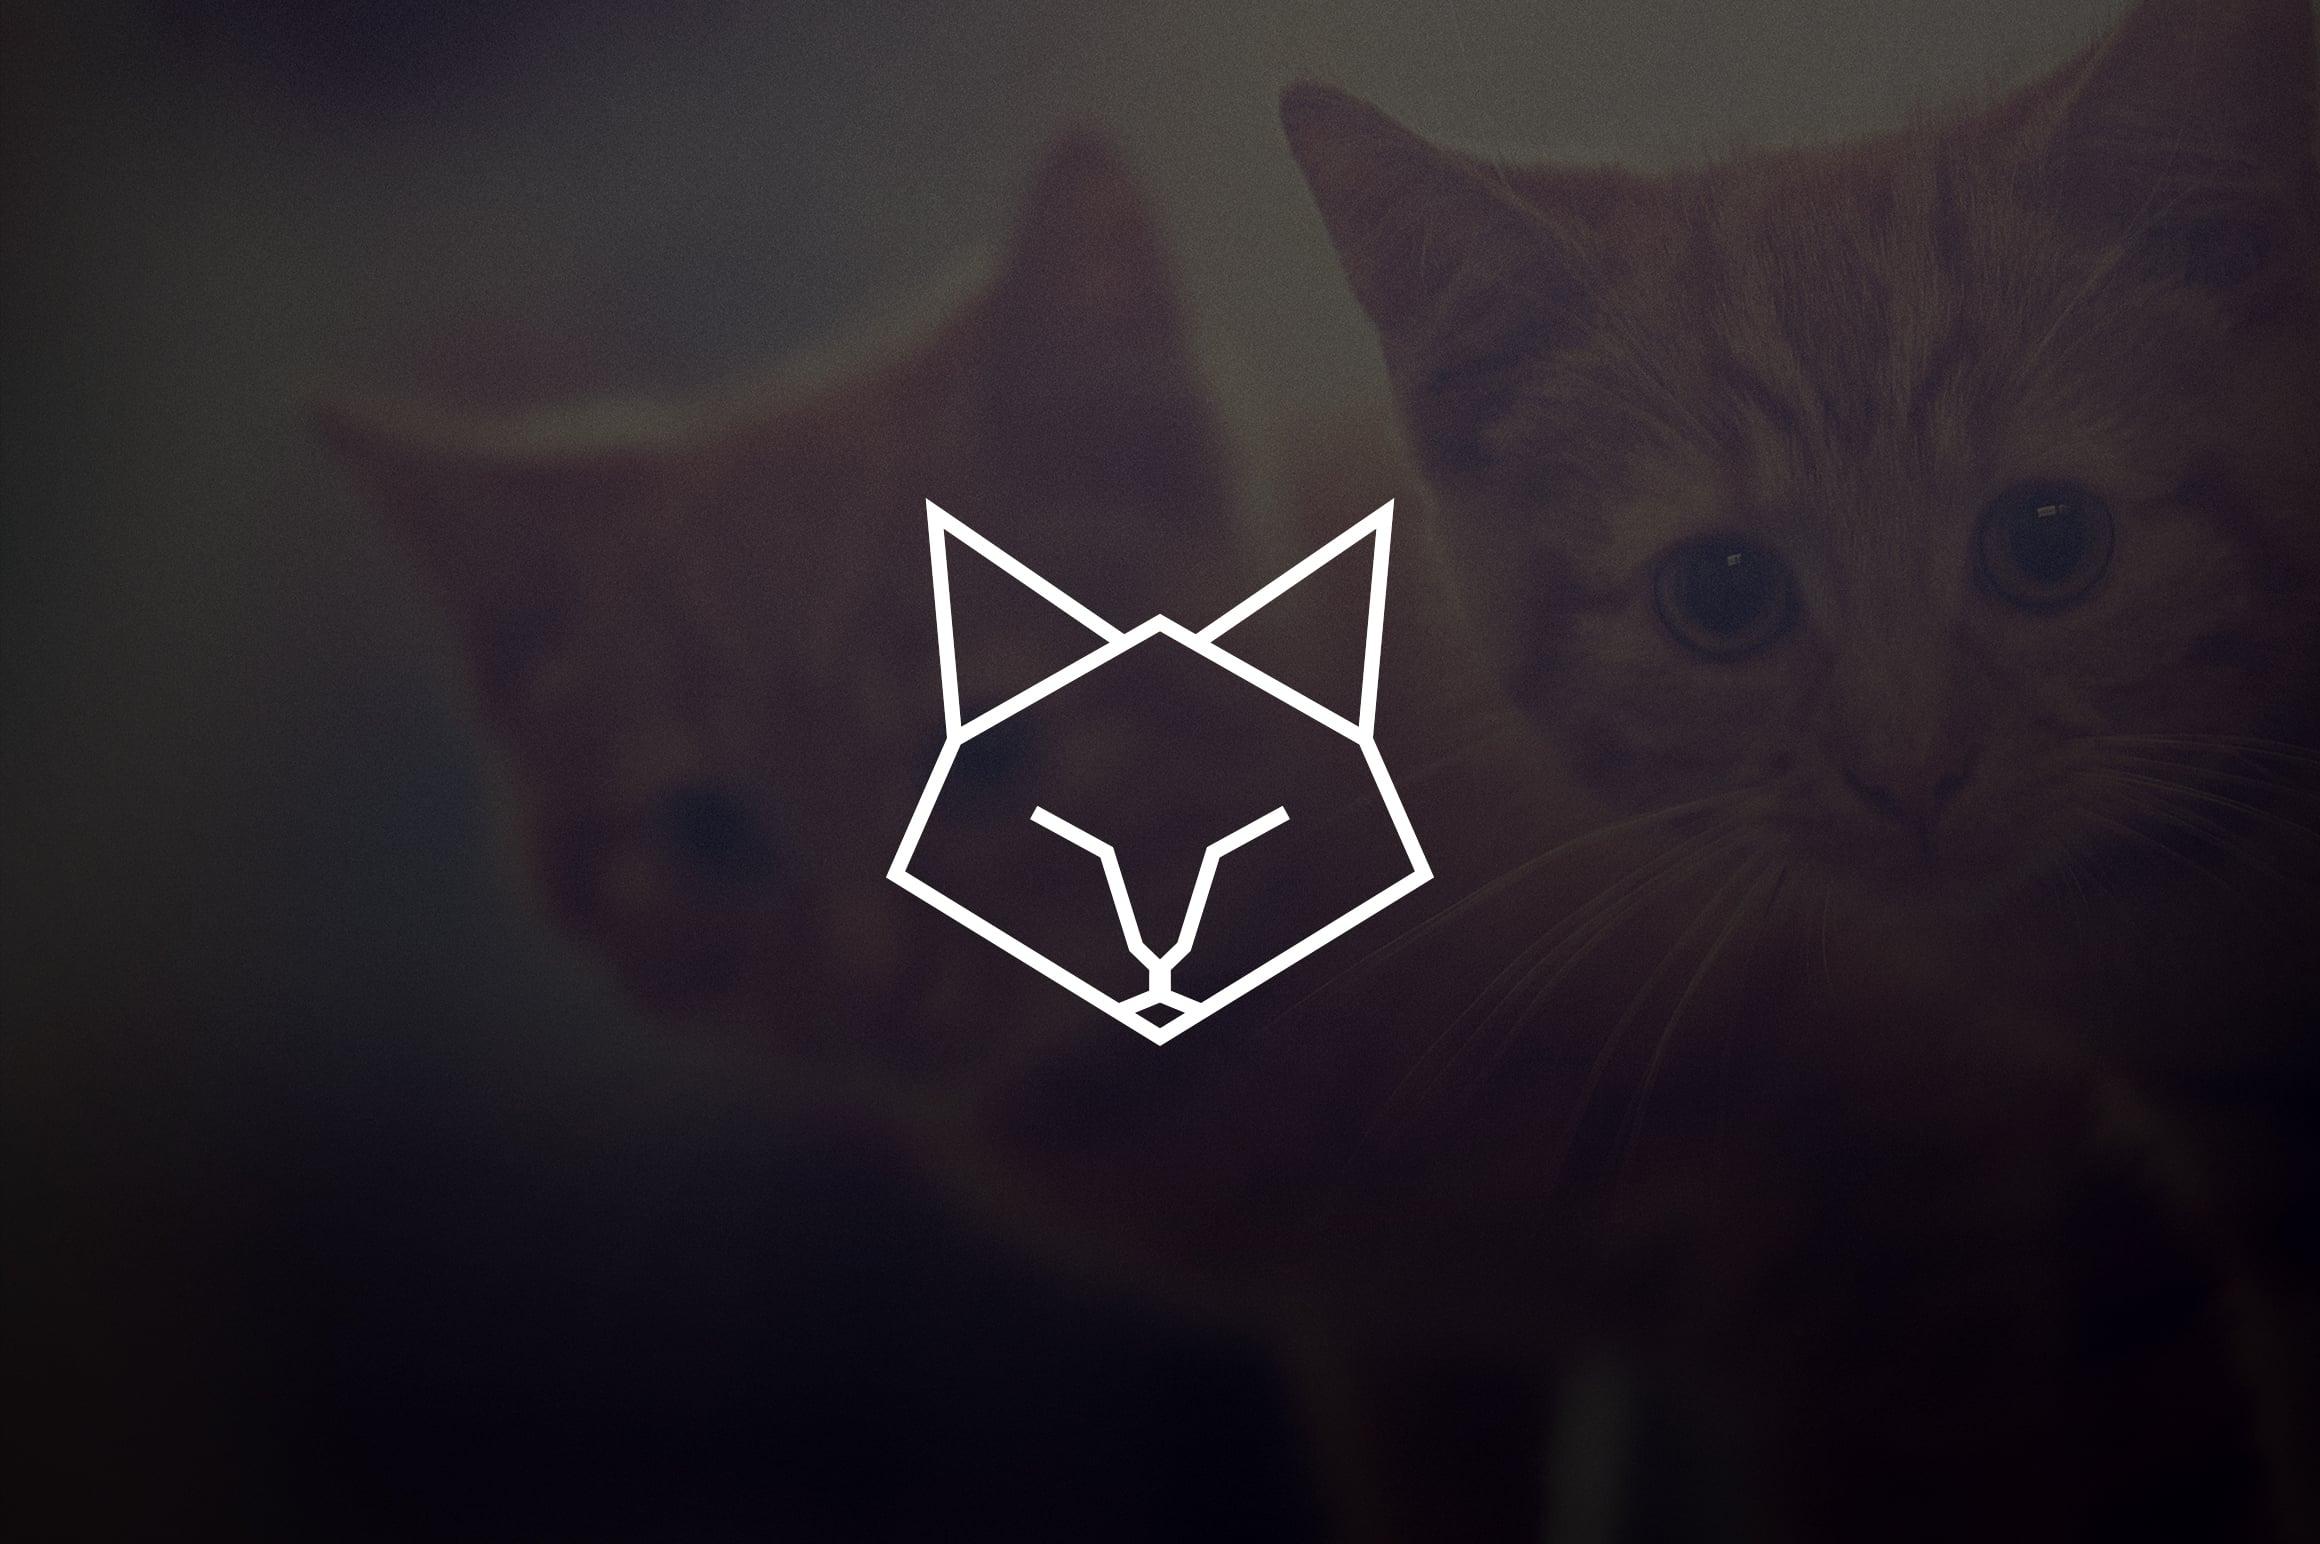 17 Geometric Animal Icons and Logos - 5